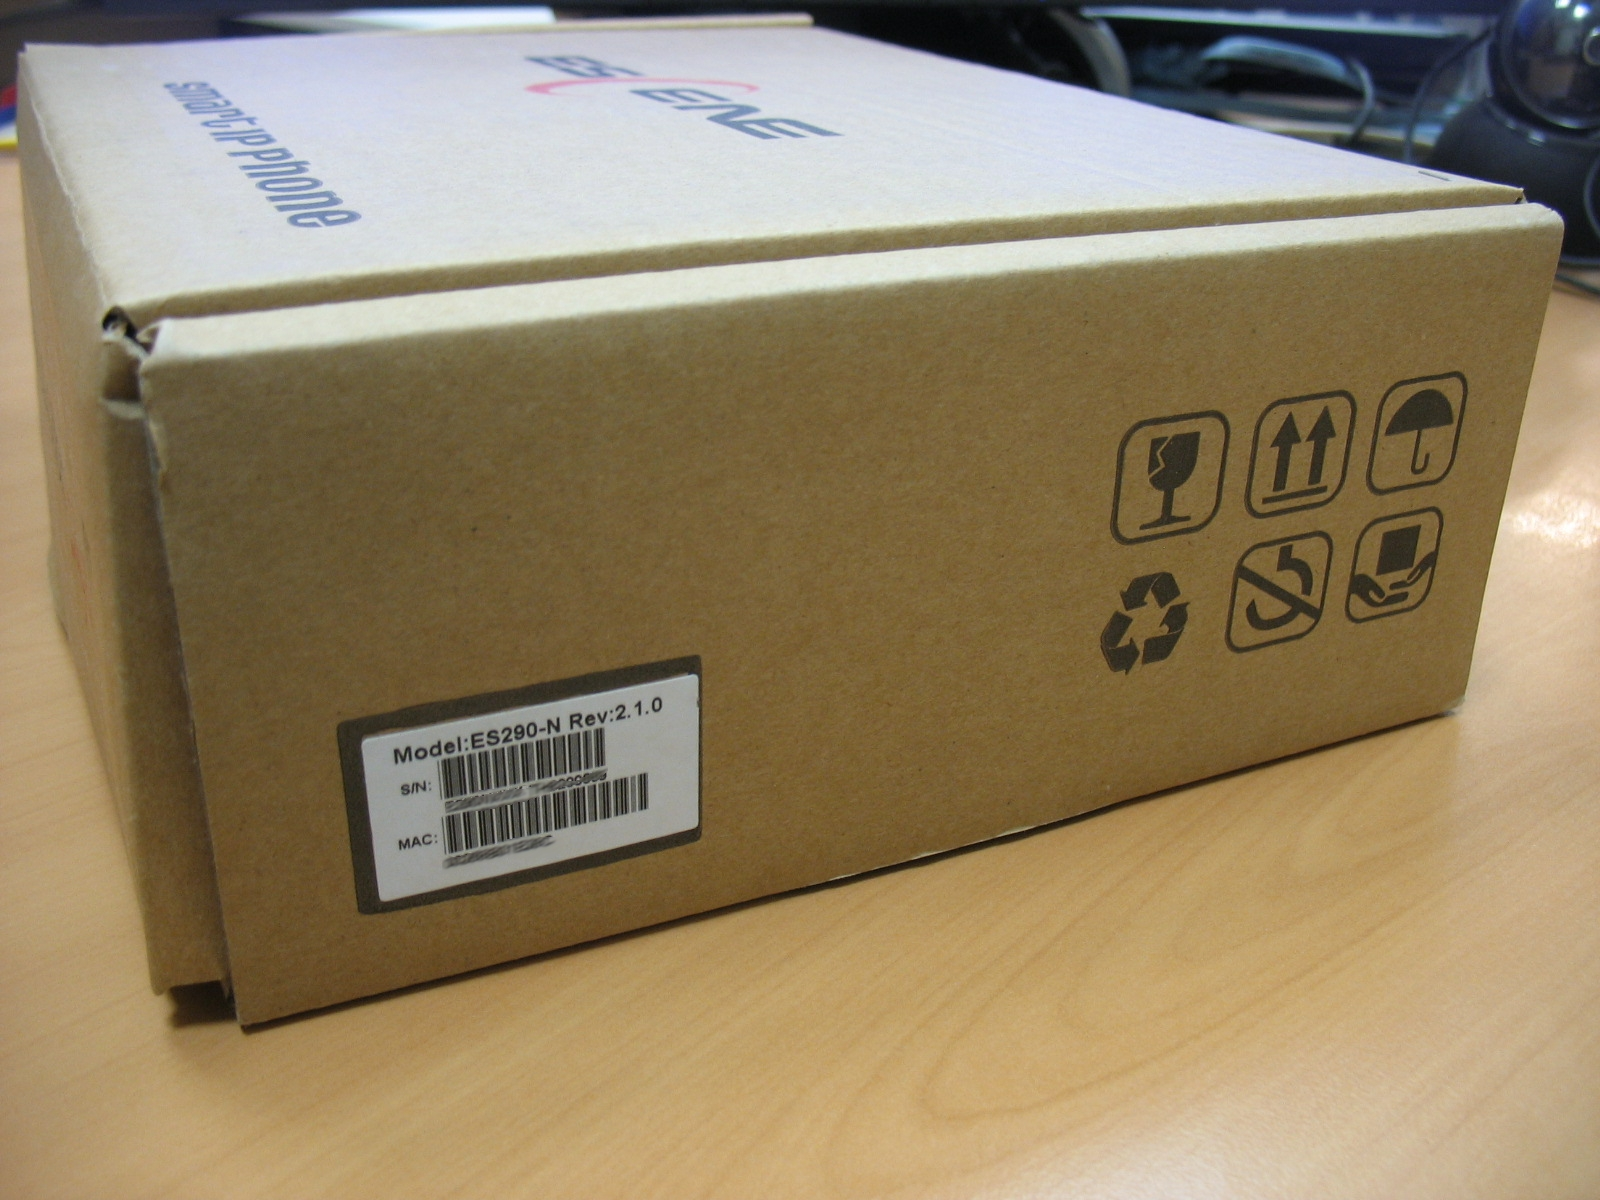 Вид упаковки телефона